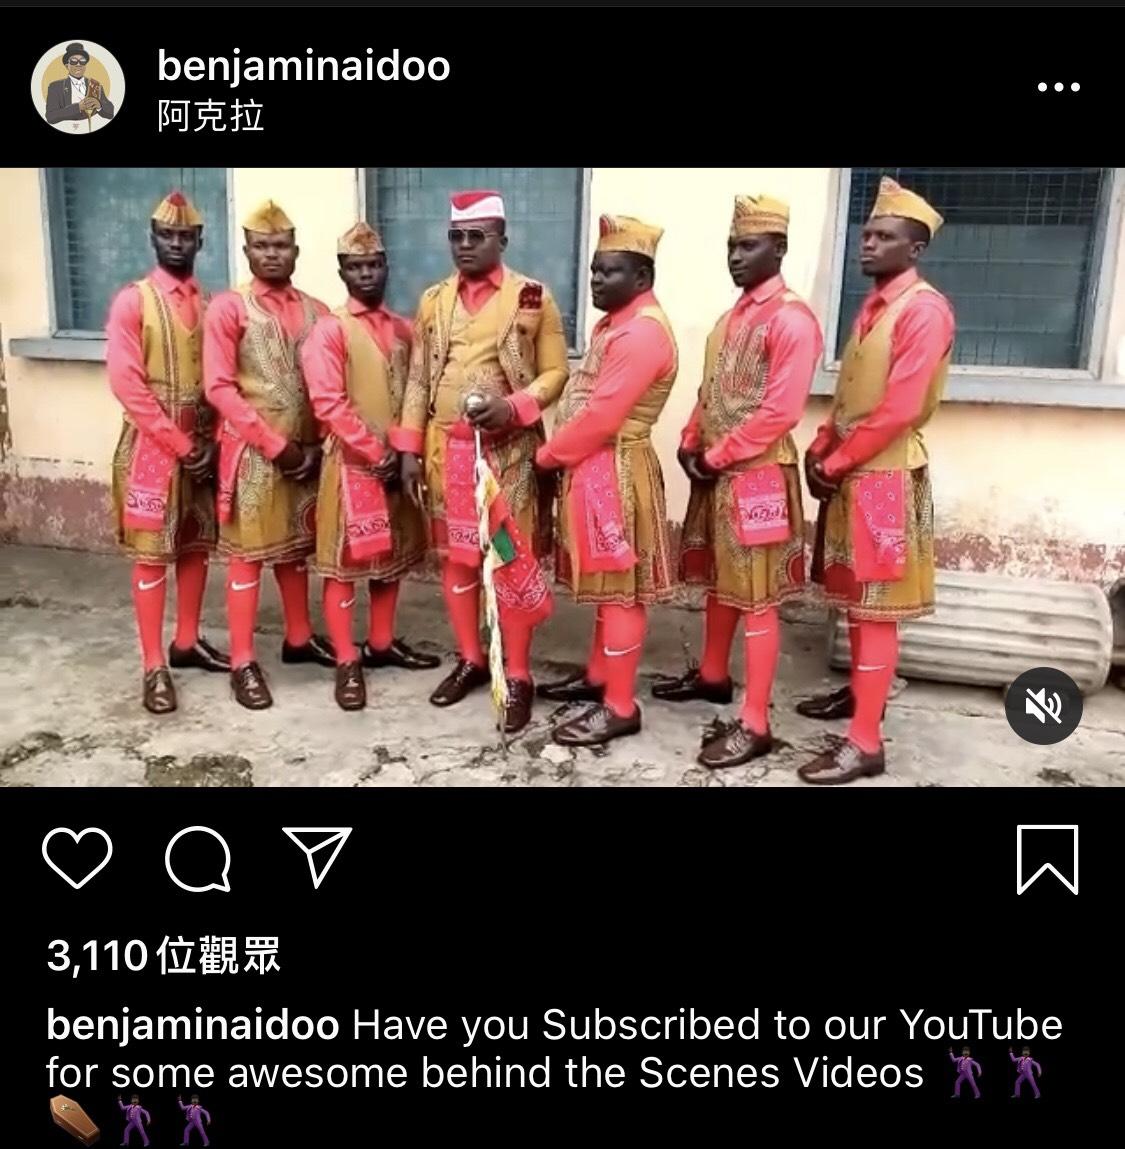 WACKYBOYS反骨男孩前日在Youtube上傳一支「黑人抬棺」影片,此舉遭不少網友怒罵,就連戴維斯也發文砲轟「無知又愚昧」。但有網友將事情經過親自寫信給迦納抬棺團隊,他們則大方表示「不介意」,甚至還在IG分享該影片。